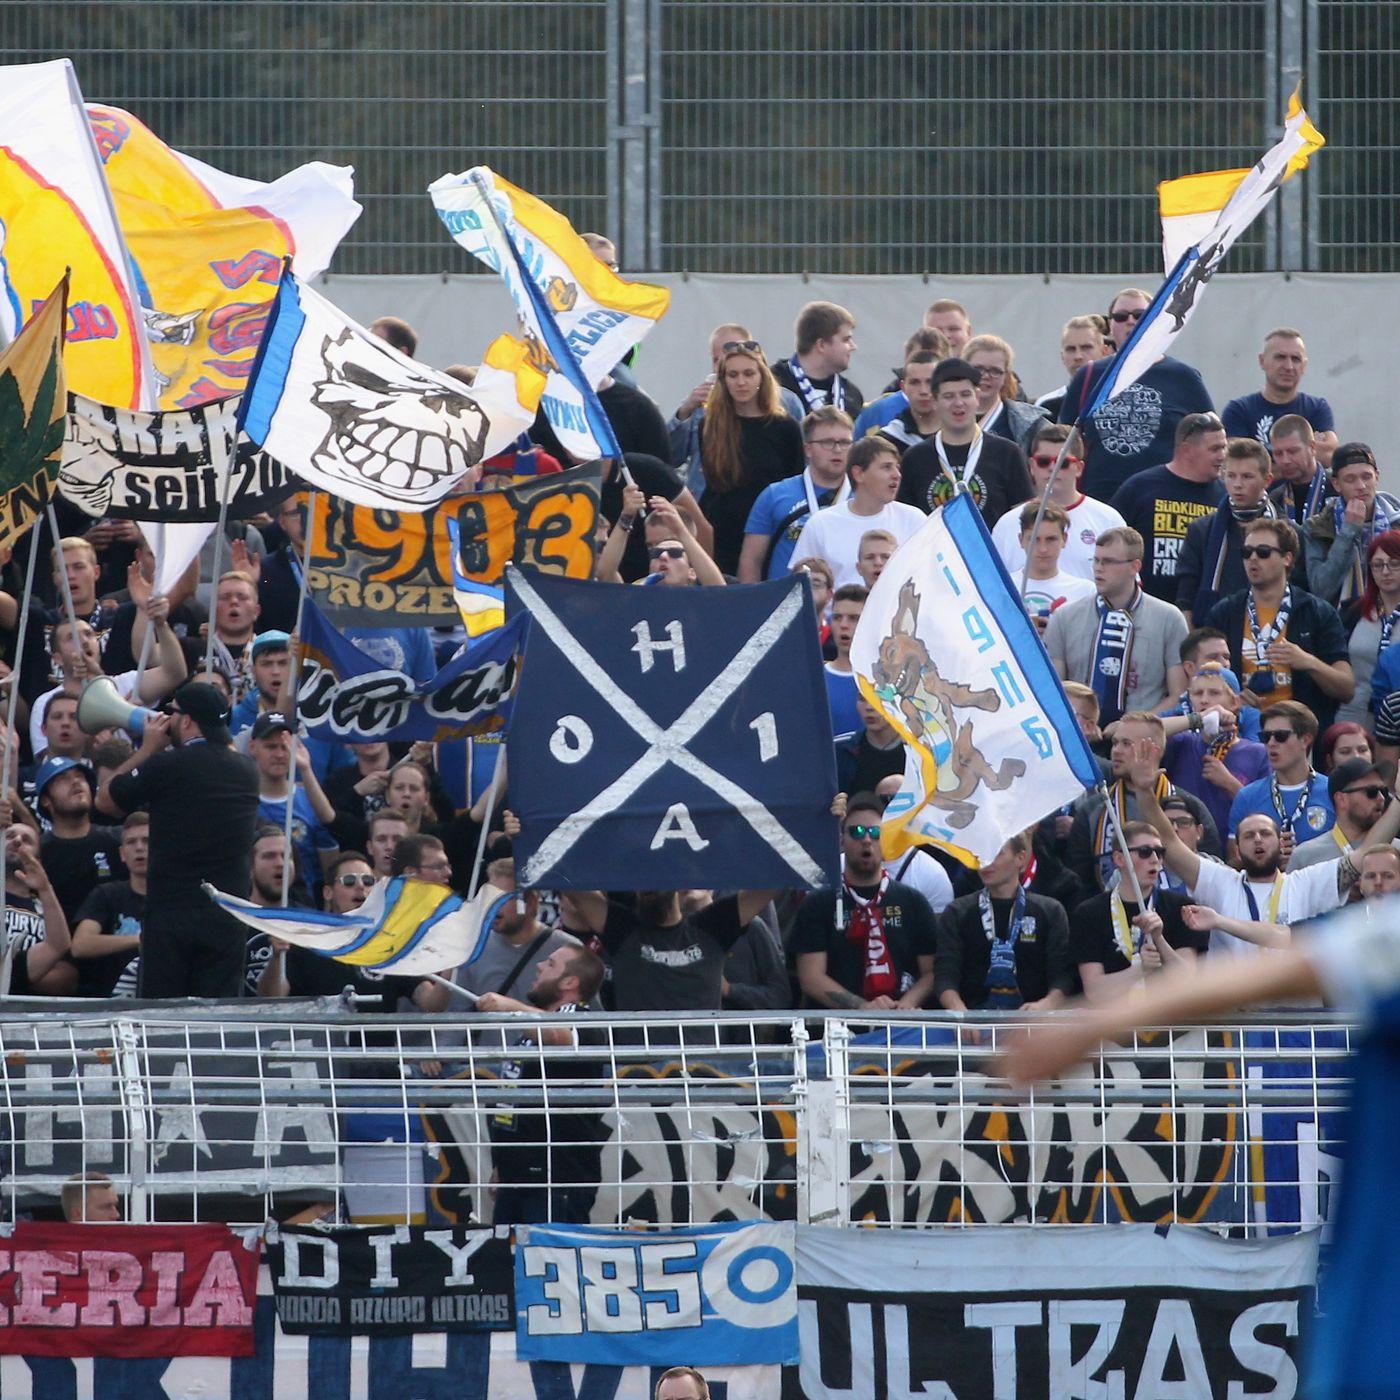 Dfb Investigates Hansa Rostock After Fish Fly In Jena Bavarian Football Works